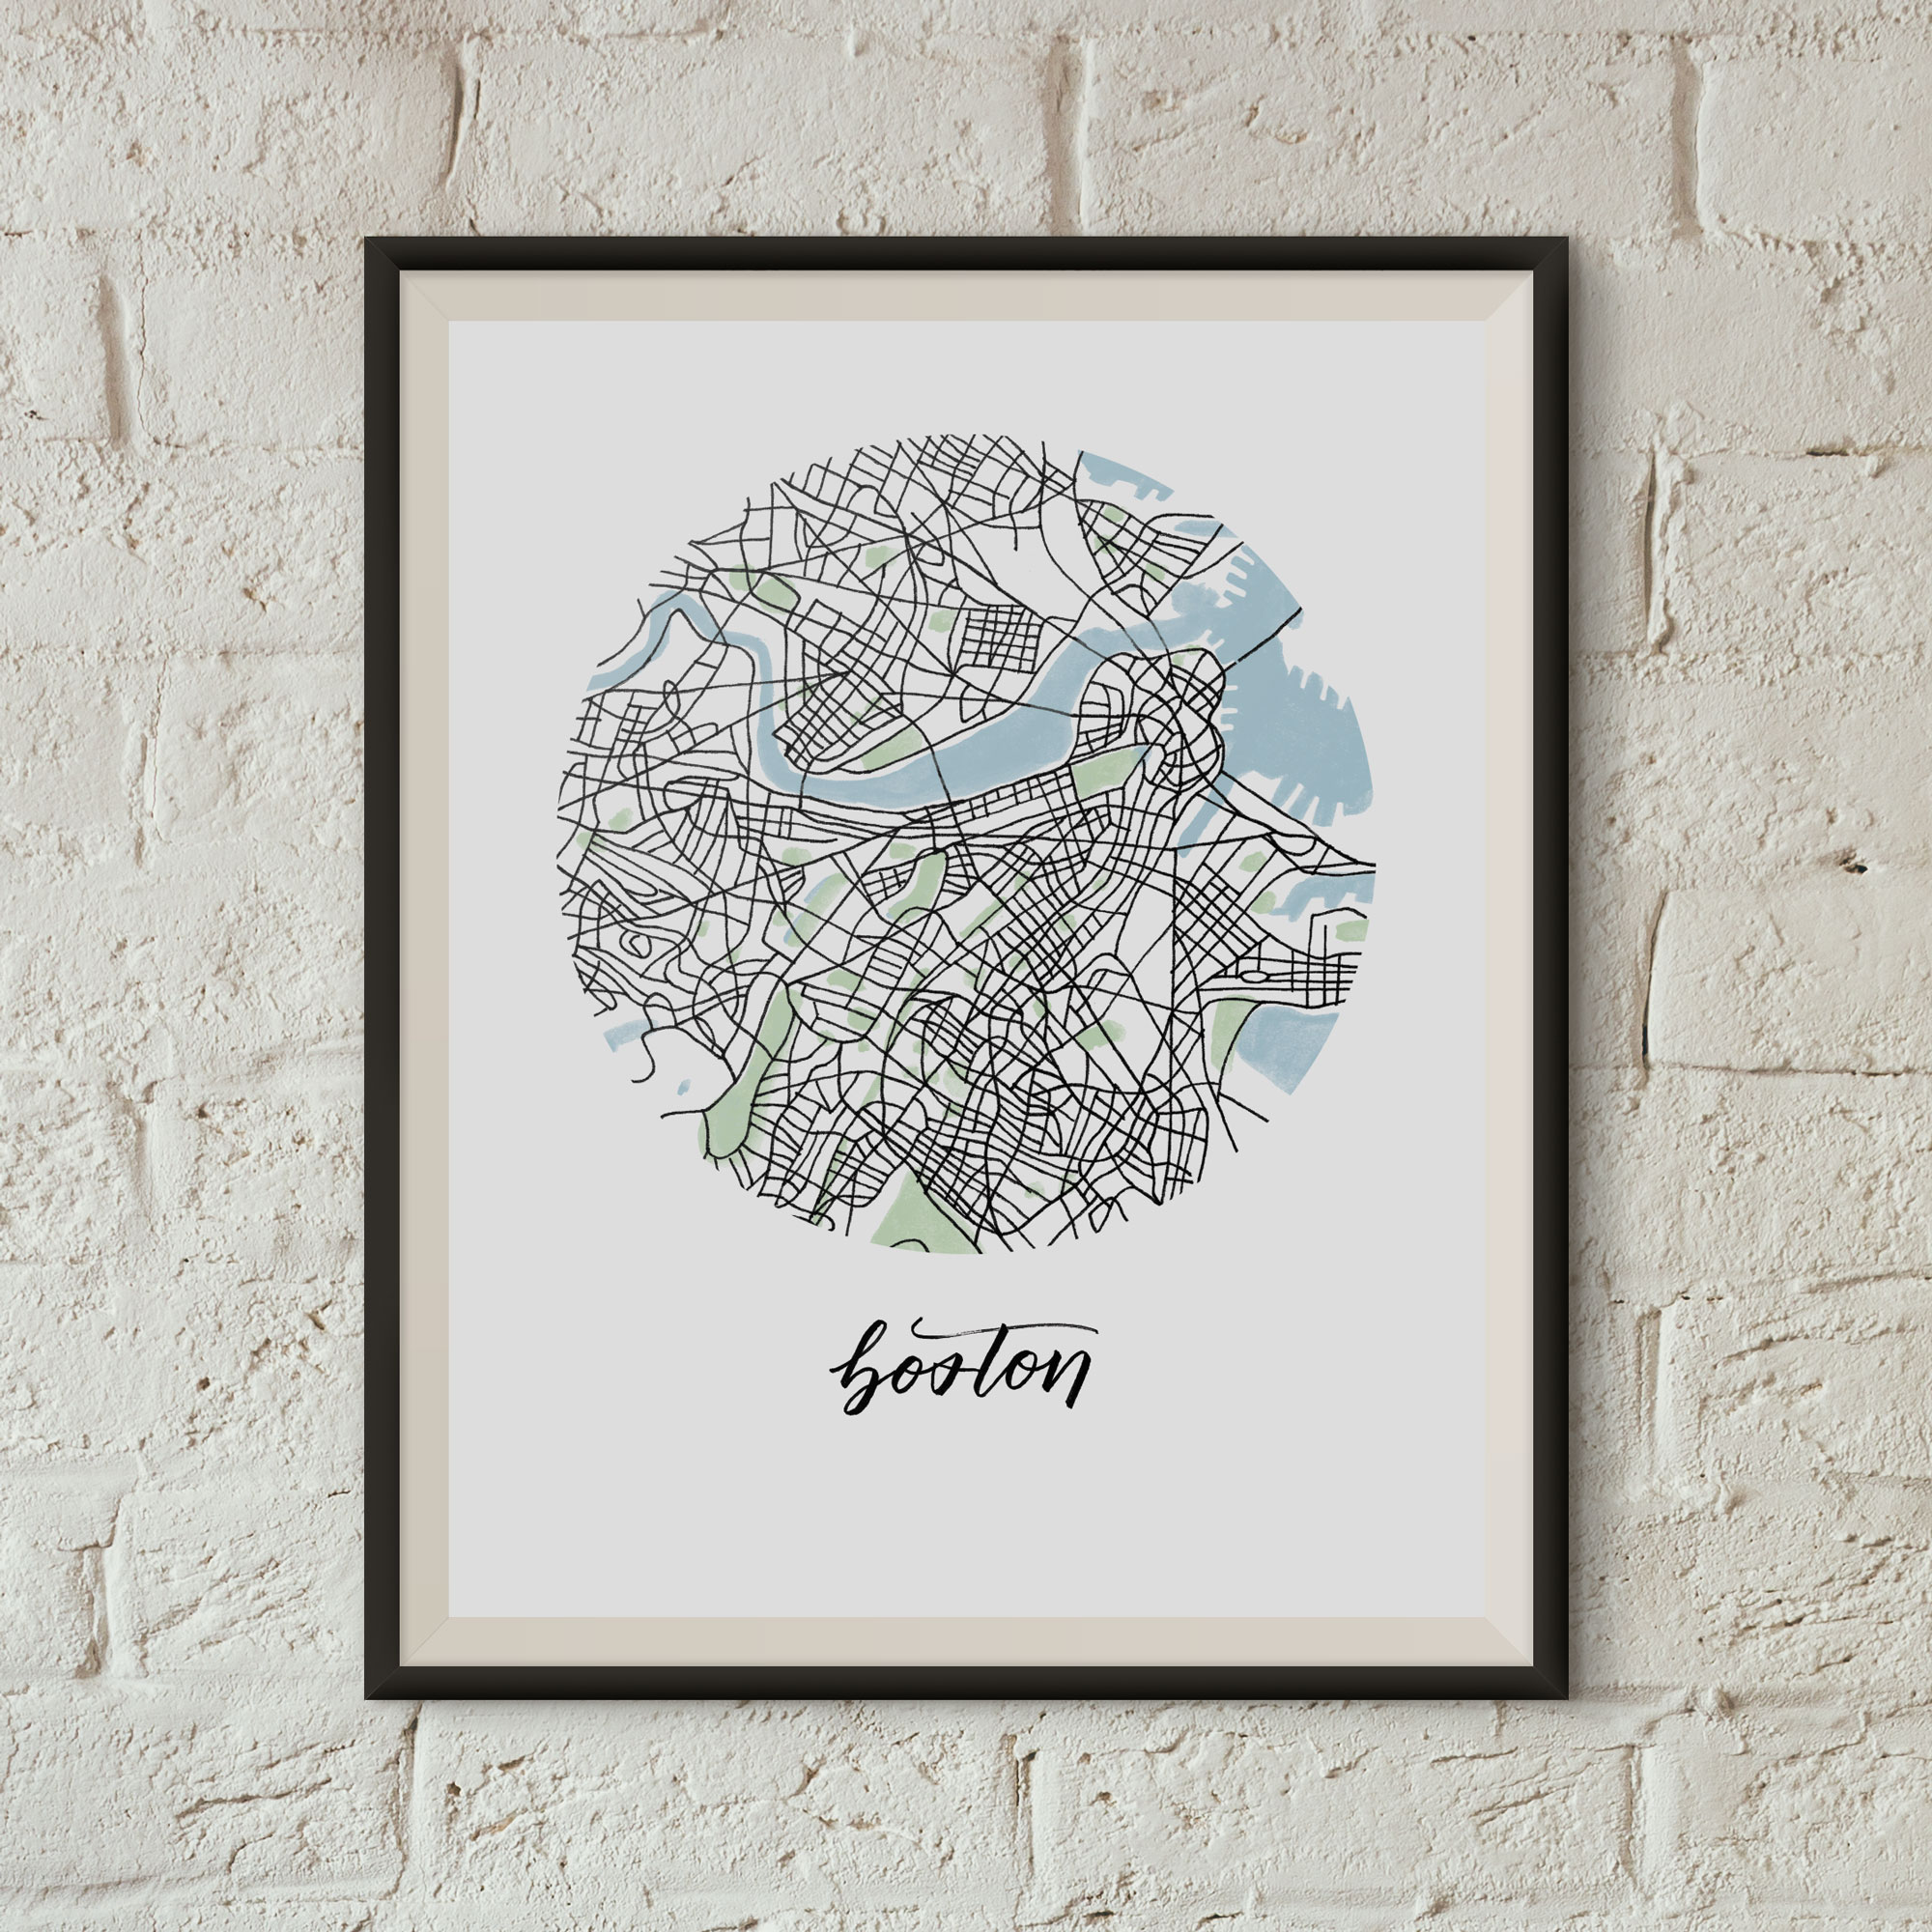 Boston Map Print framed on a white brick wall